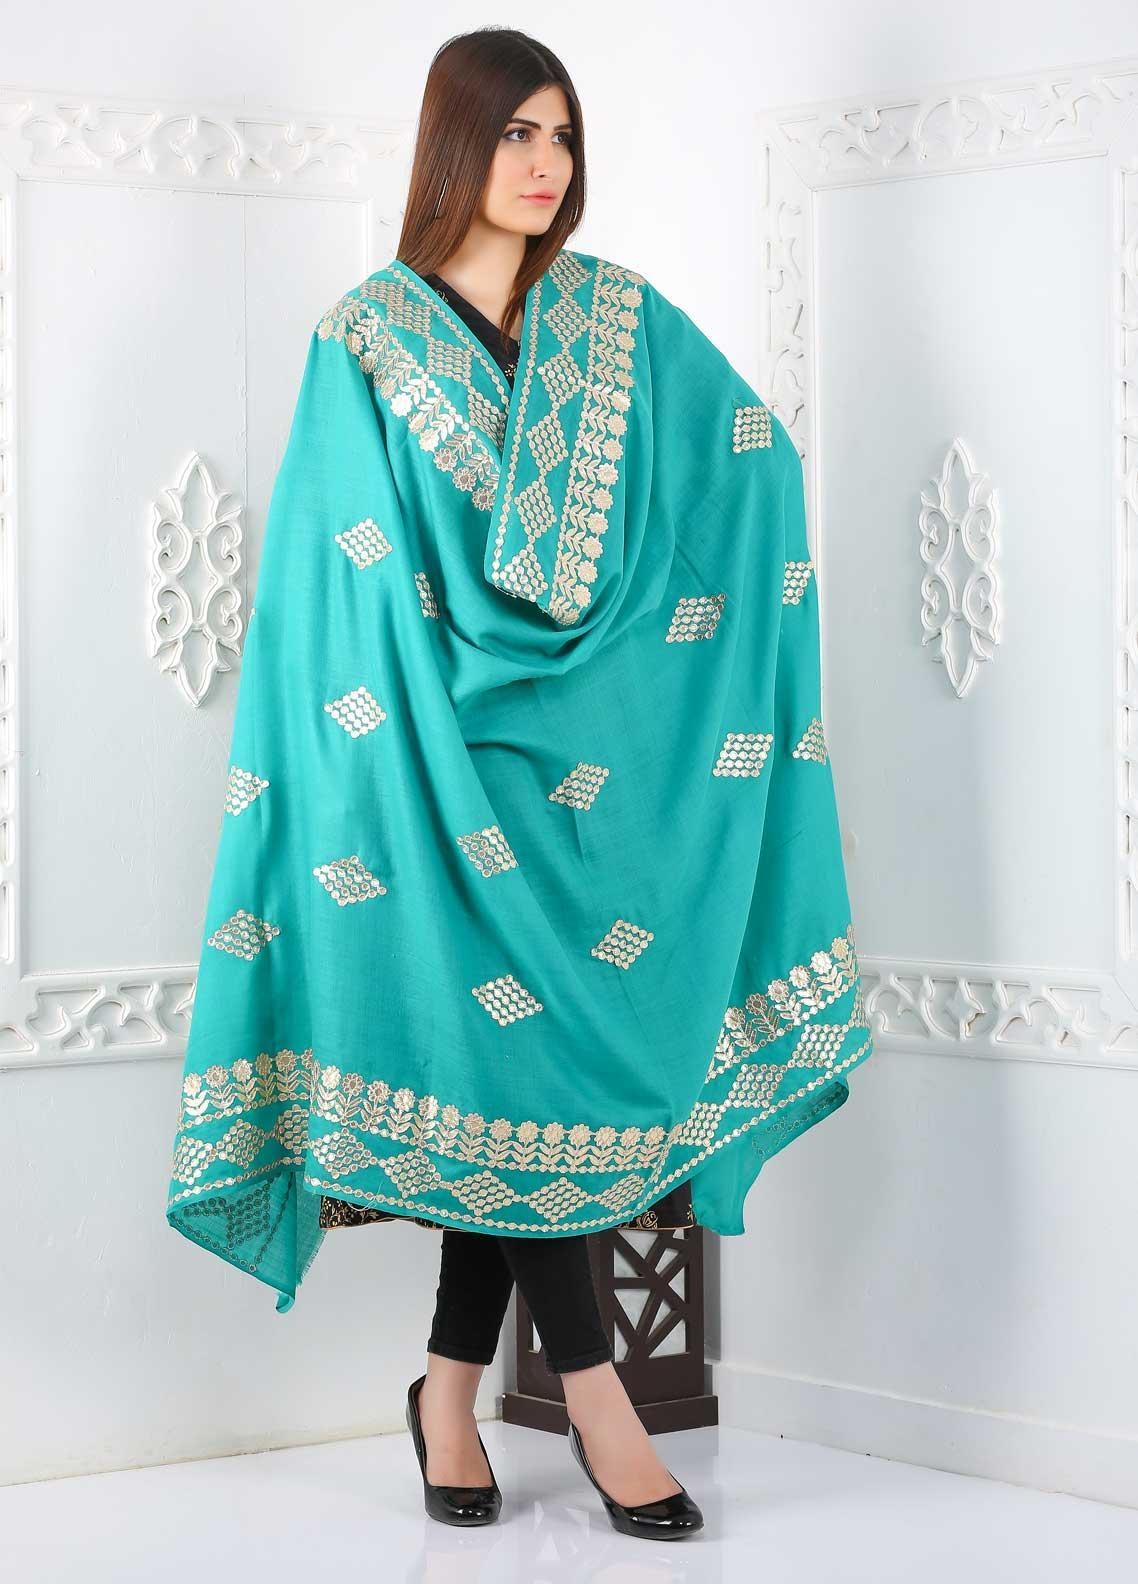 Sanaulla Exclusive Range Embroidered Pashmina  Shawl Gota Work Shawl 323497 - Pashmina Shawls